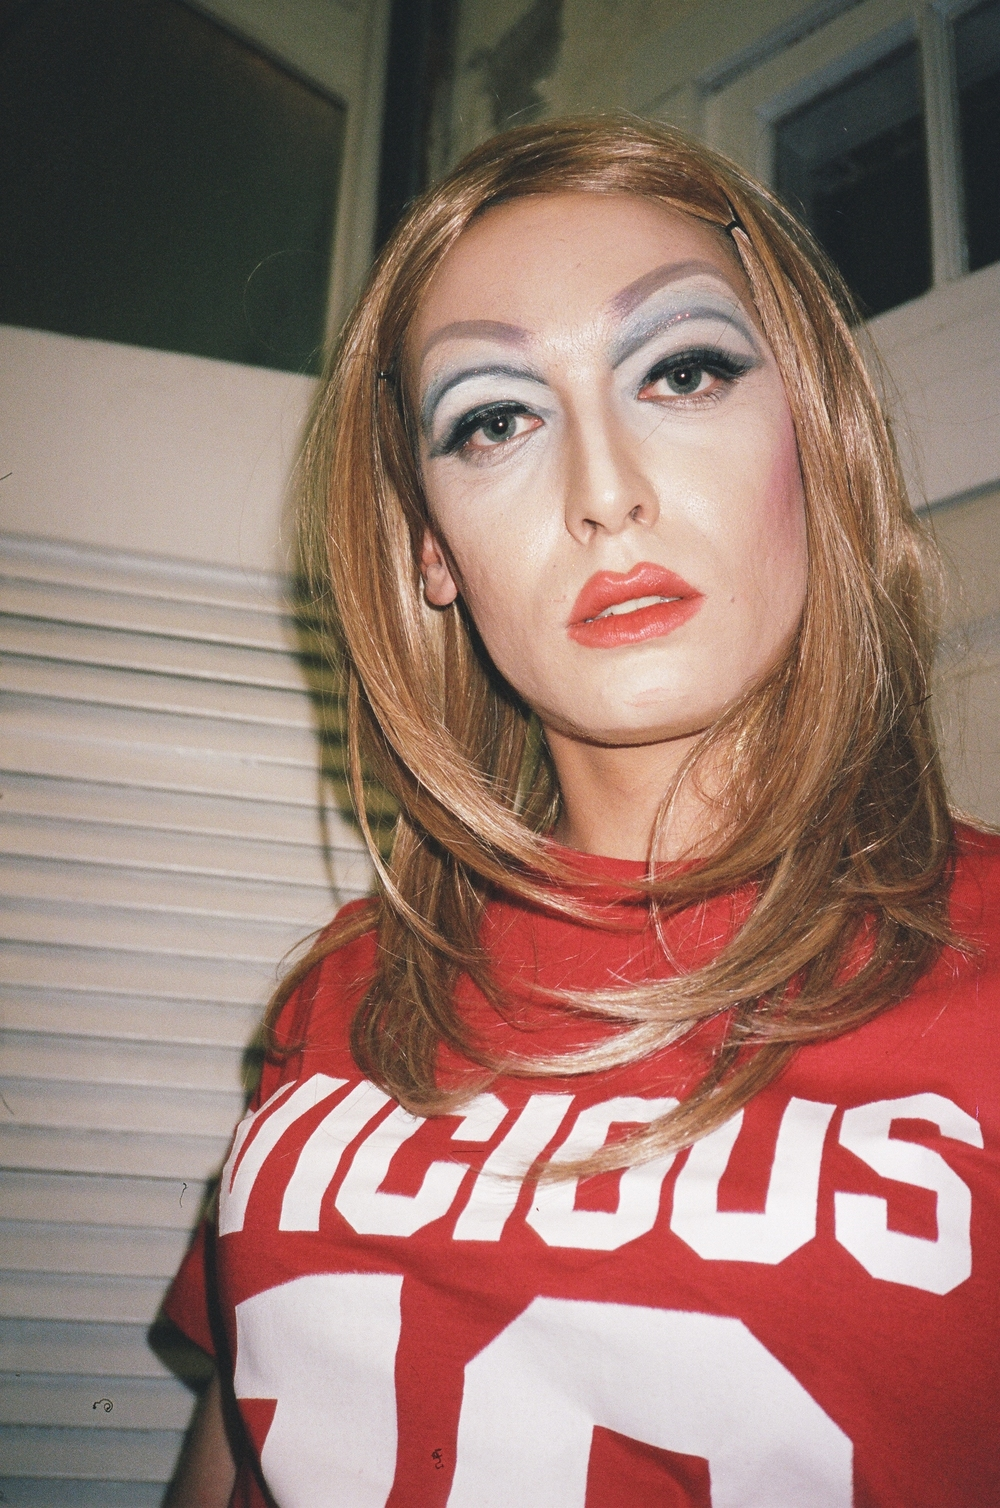 Drag Selfie (Vicious), 2015